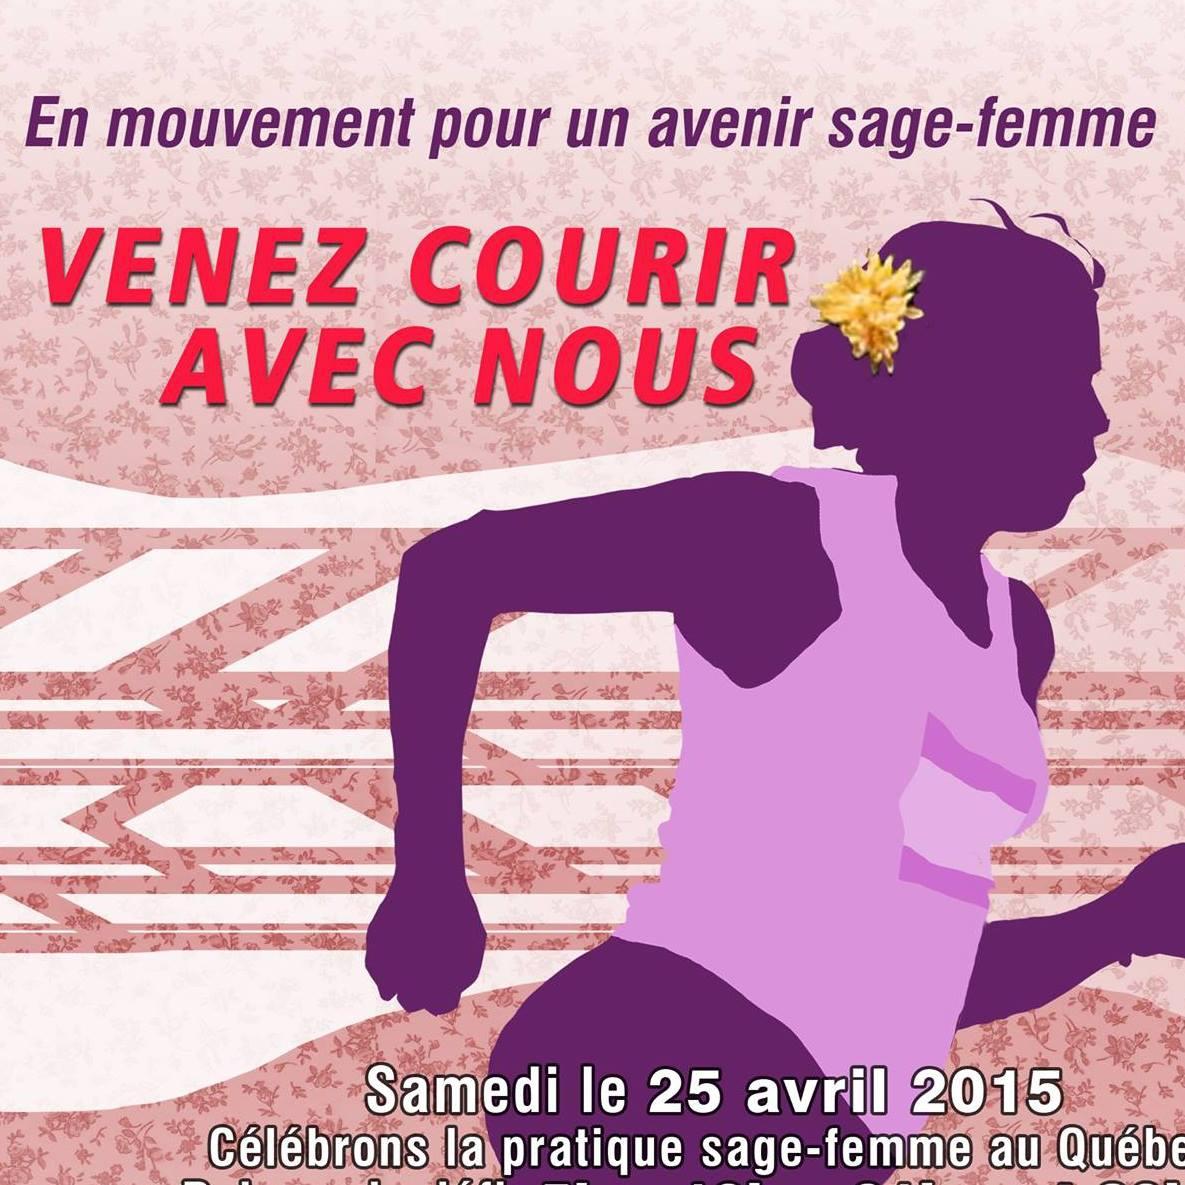 participation  u00c0 la course 25 avril 2015  u2013 co